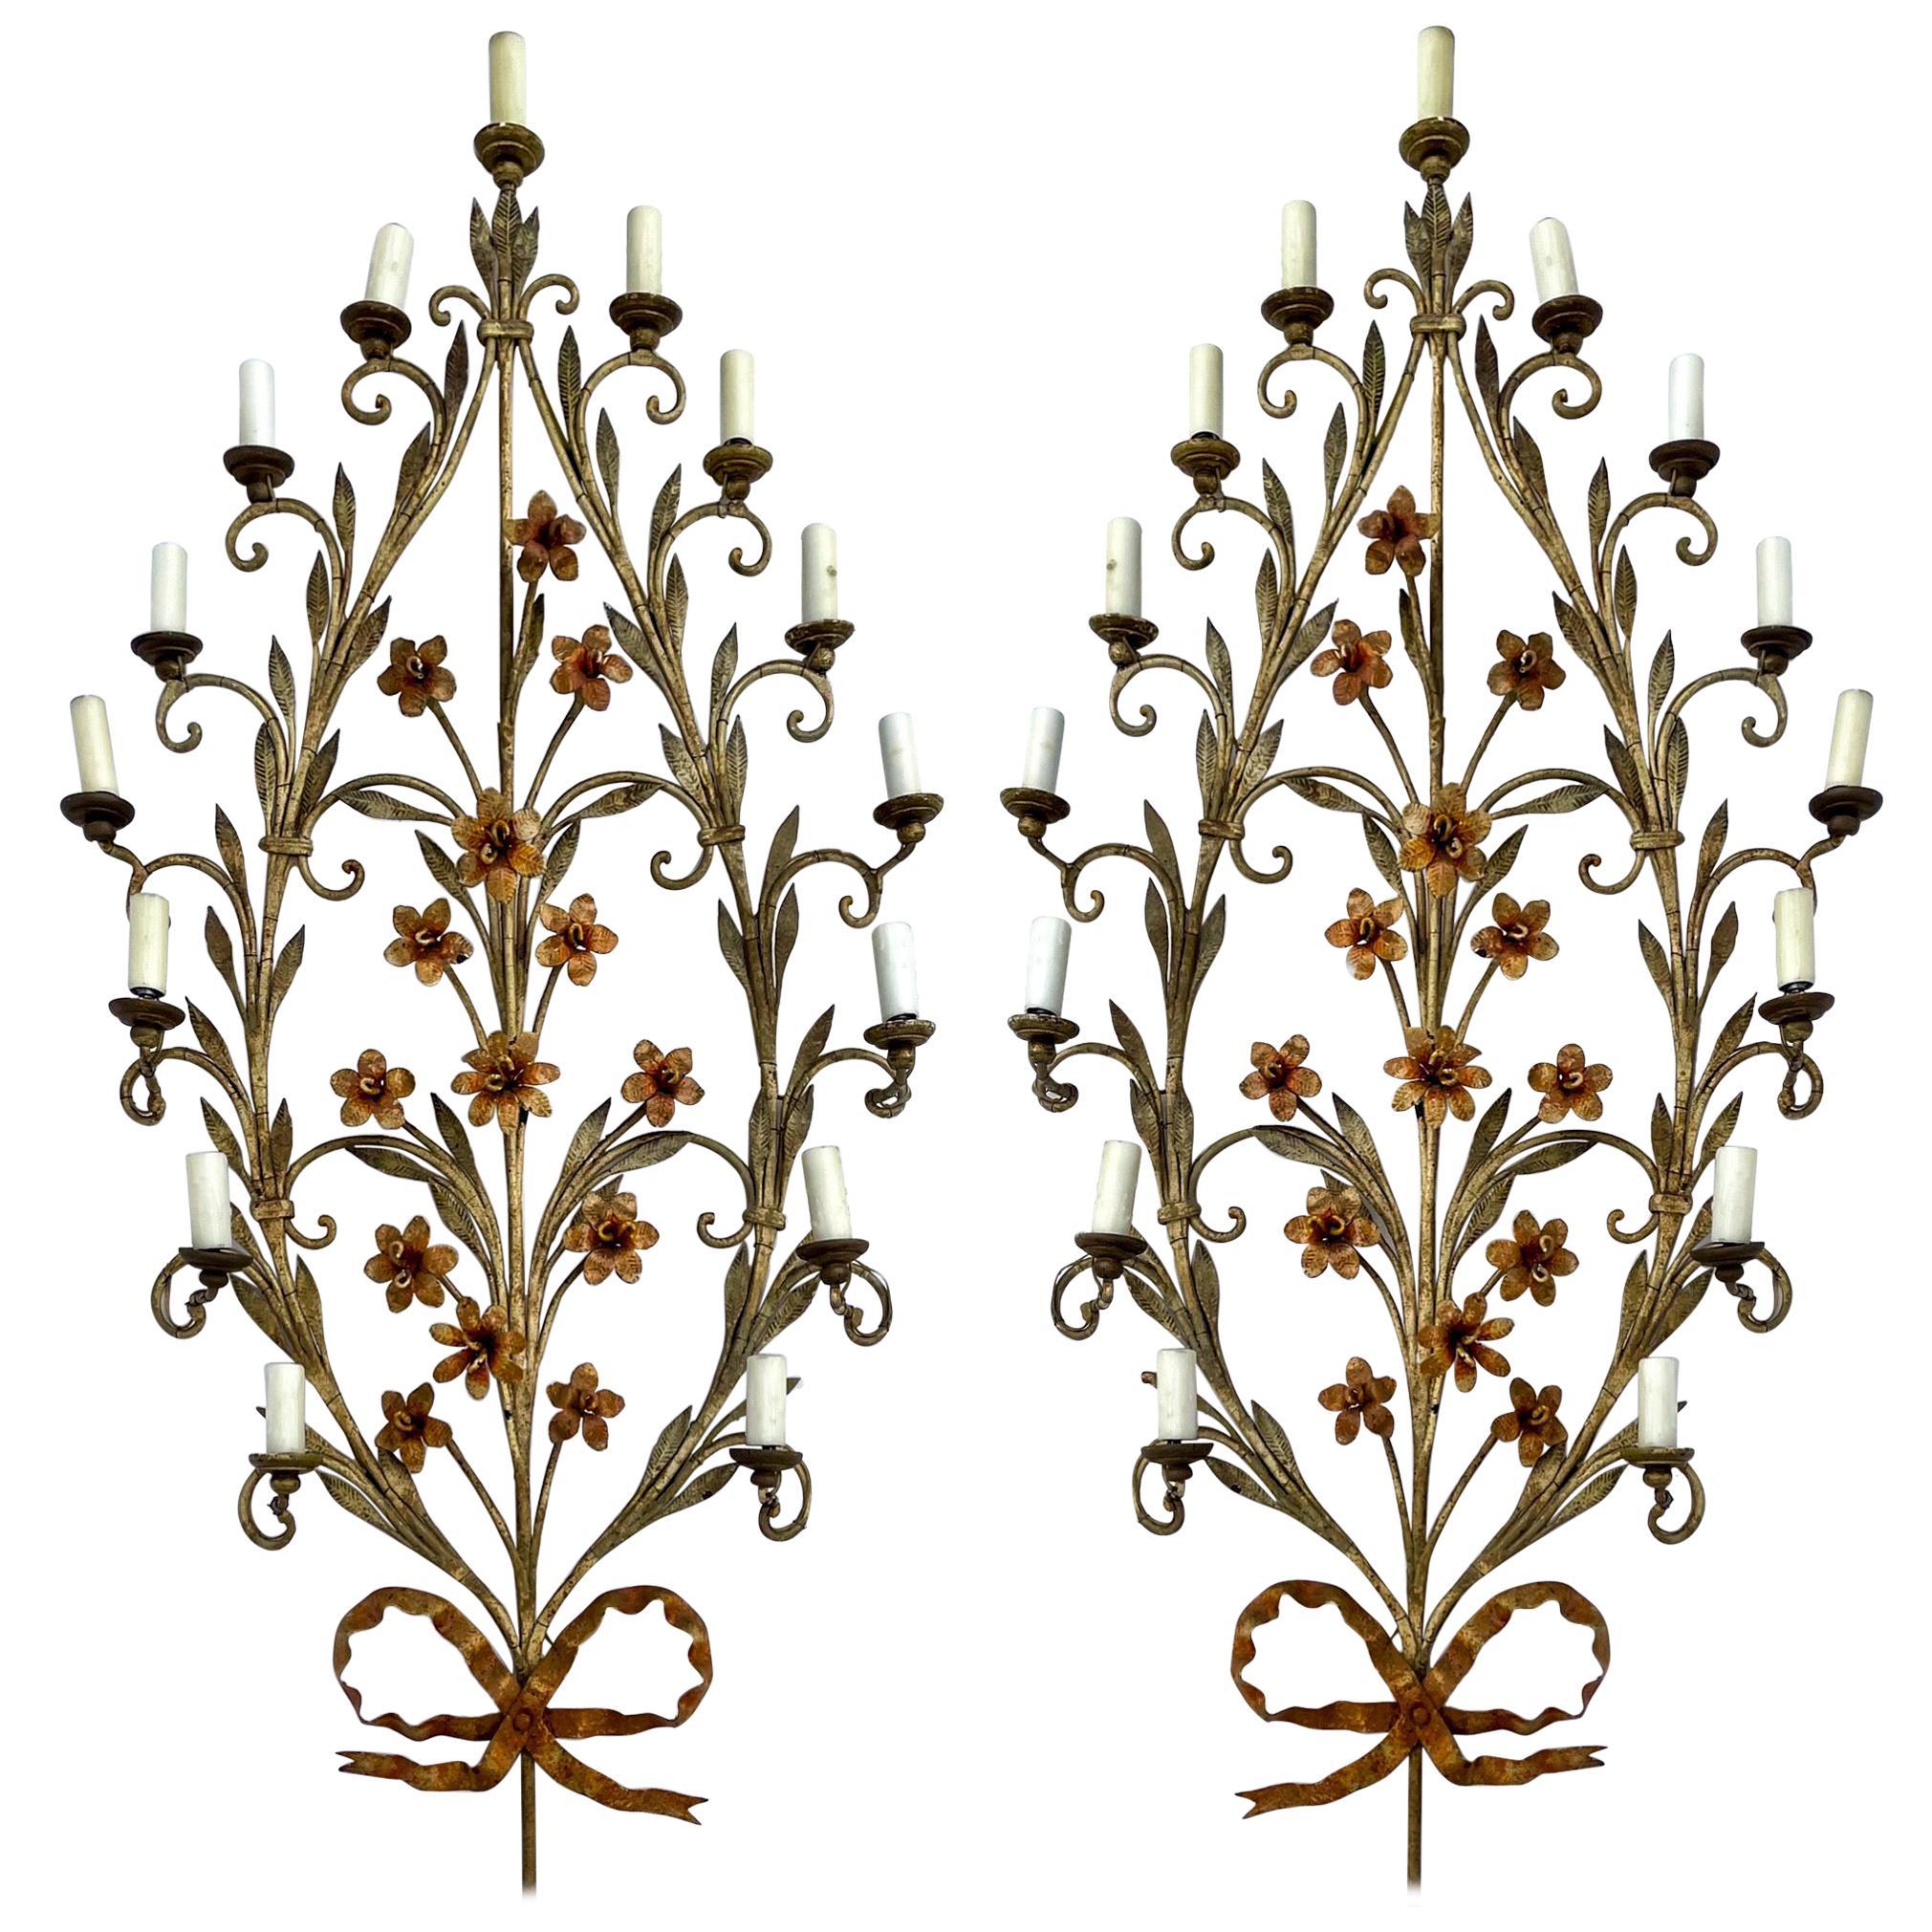 Midcentury Large Scale Italian Floral Tole Sconces, Pair